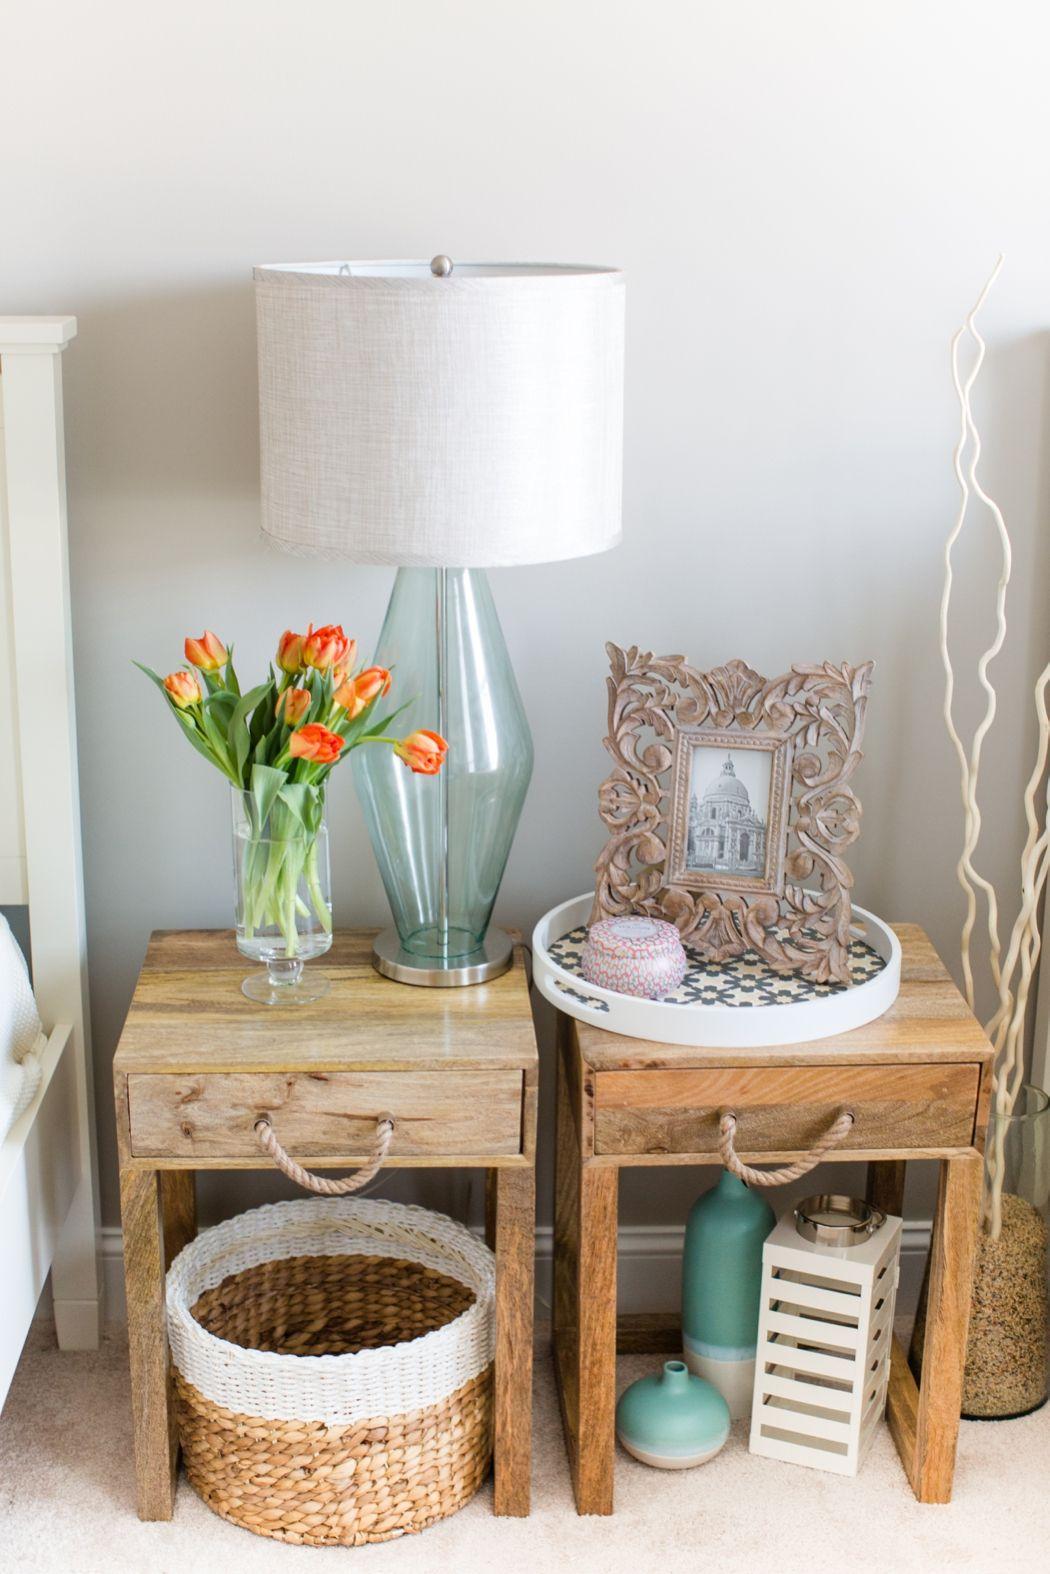 Liz Carroll Interiors Peach and Light Green Bedroom